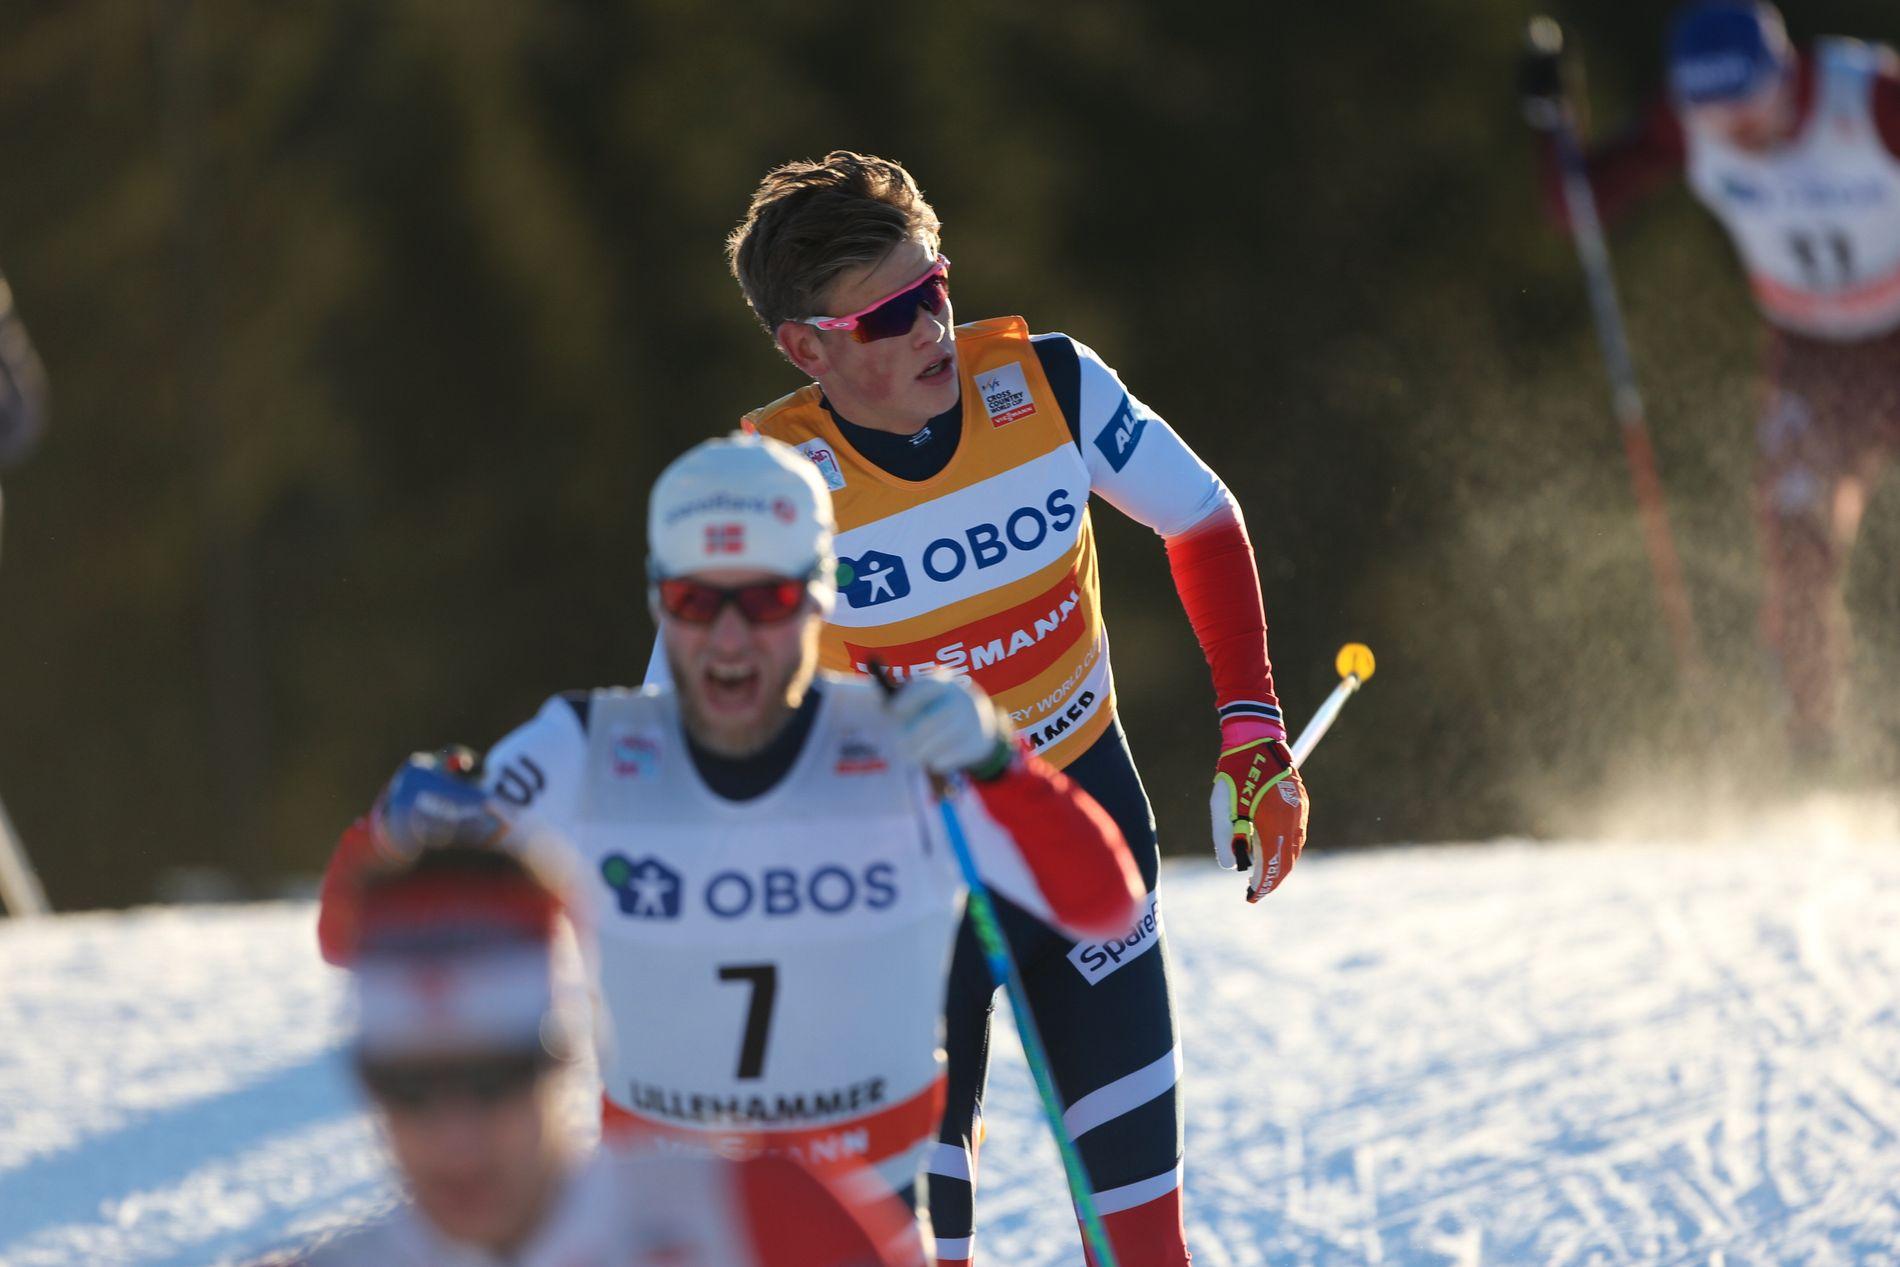 Johannes Høsflot Klæbo like bak Martin Johnsrud Sundby under tremila på Lillehammer i desember 2017.